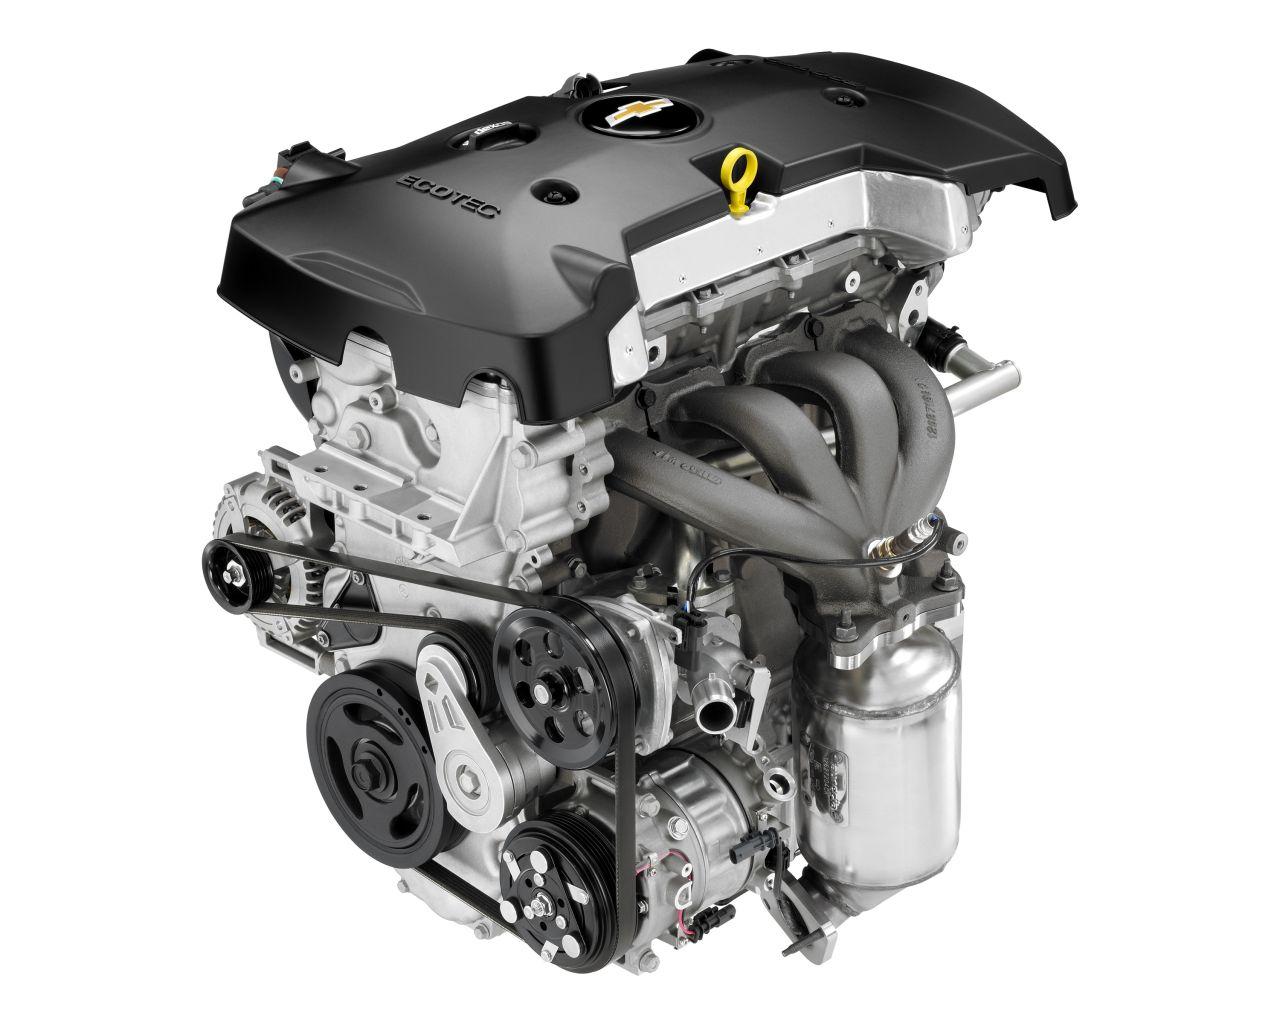 2008 Equinox Fuse Box Manual Of Wiring Diagram 2011 Chevy Ecotec 2 0 Turbo Gm Vvt Engines Free Engine Image